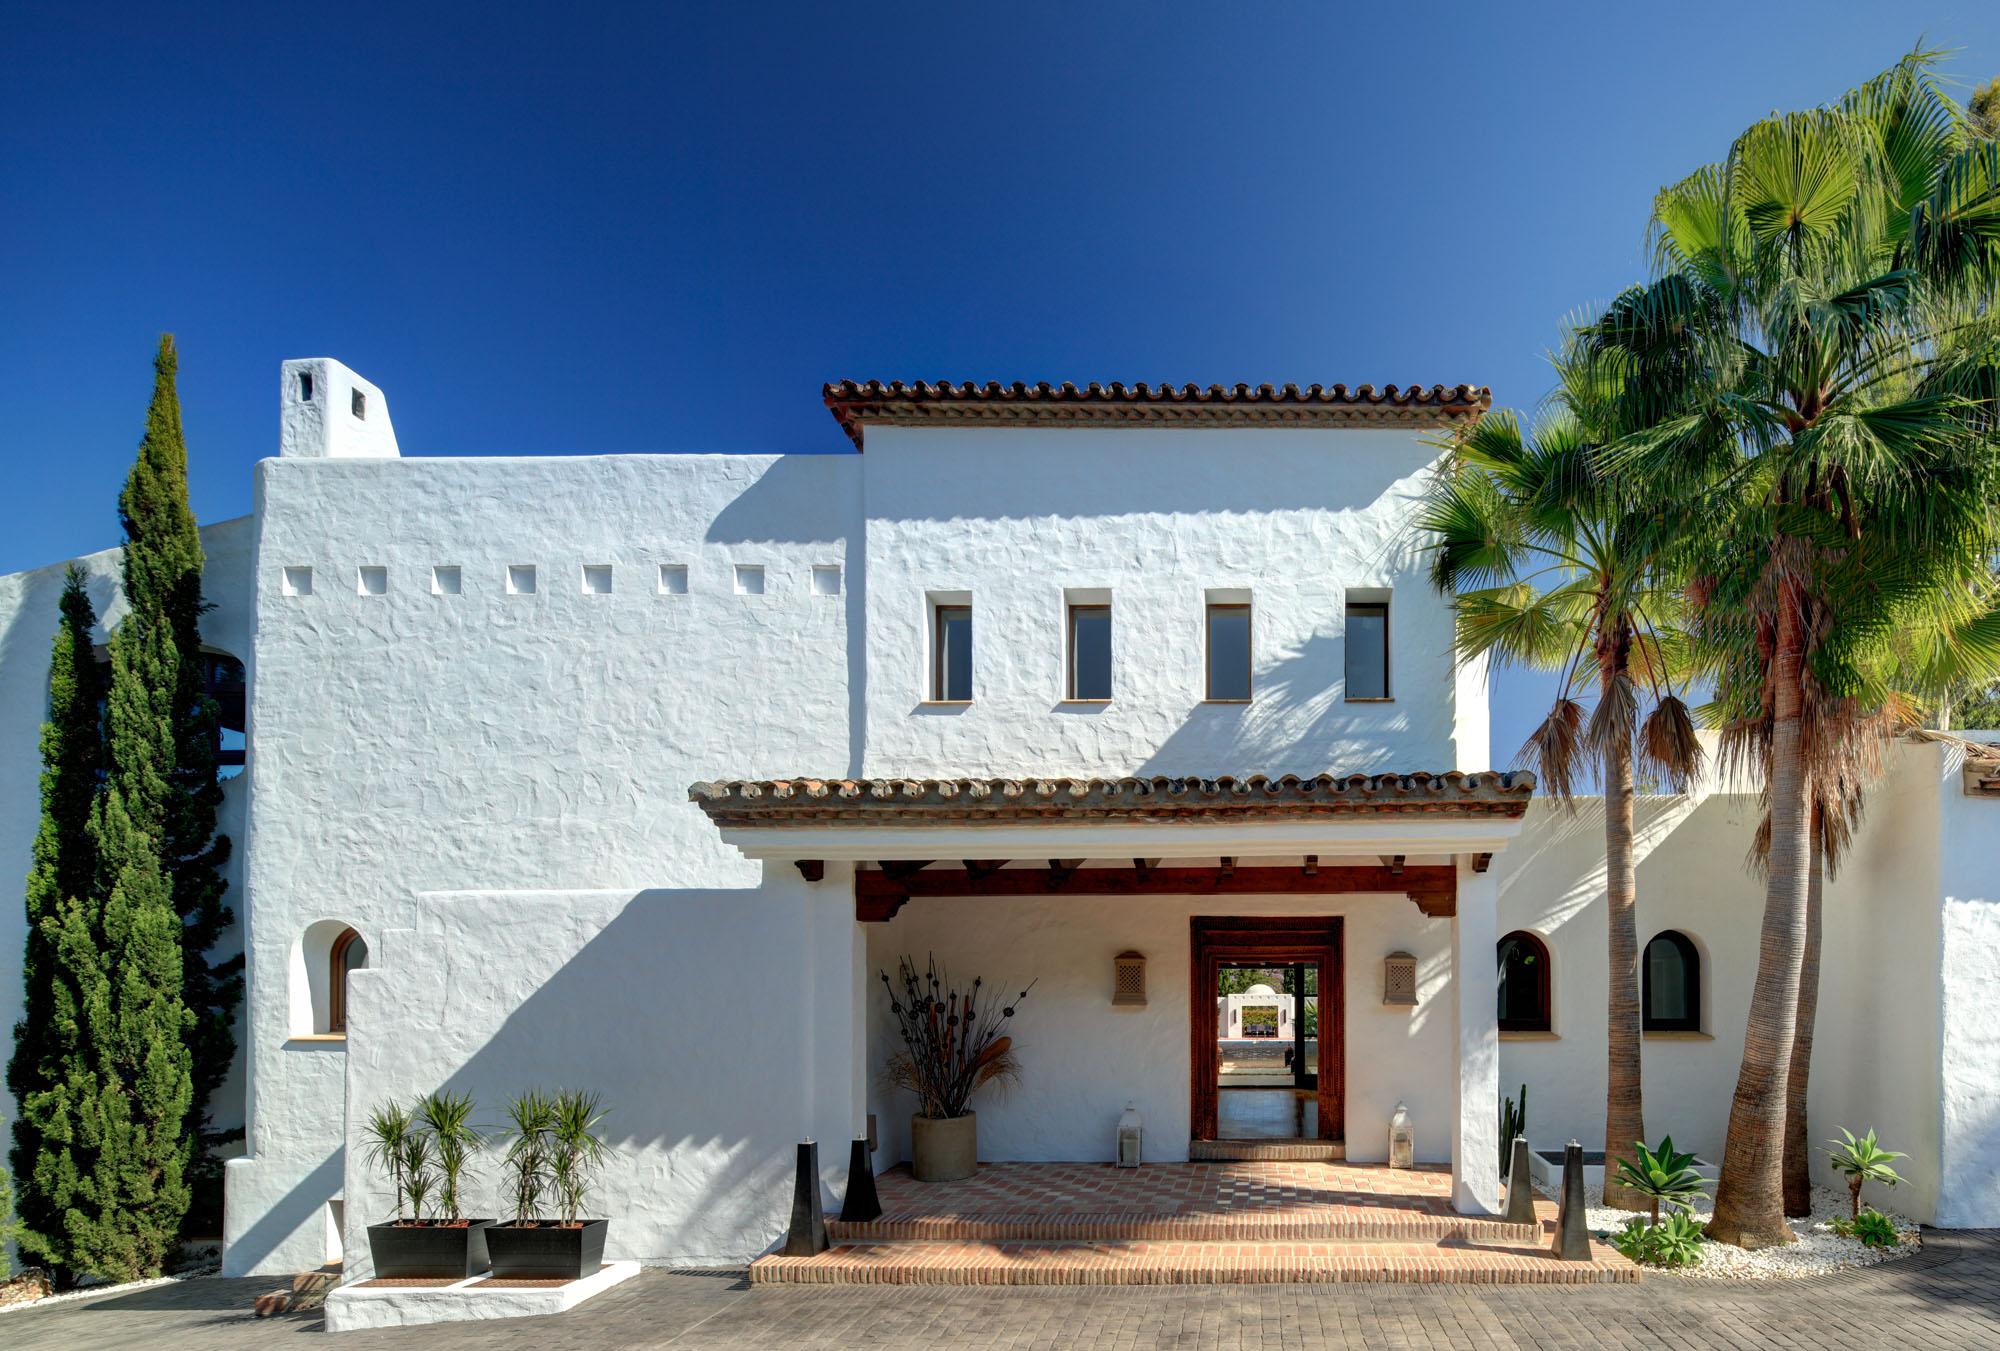 359-00100P: Villa in Marbella